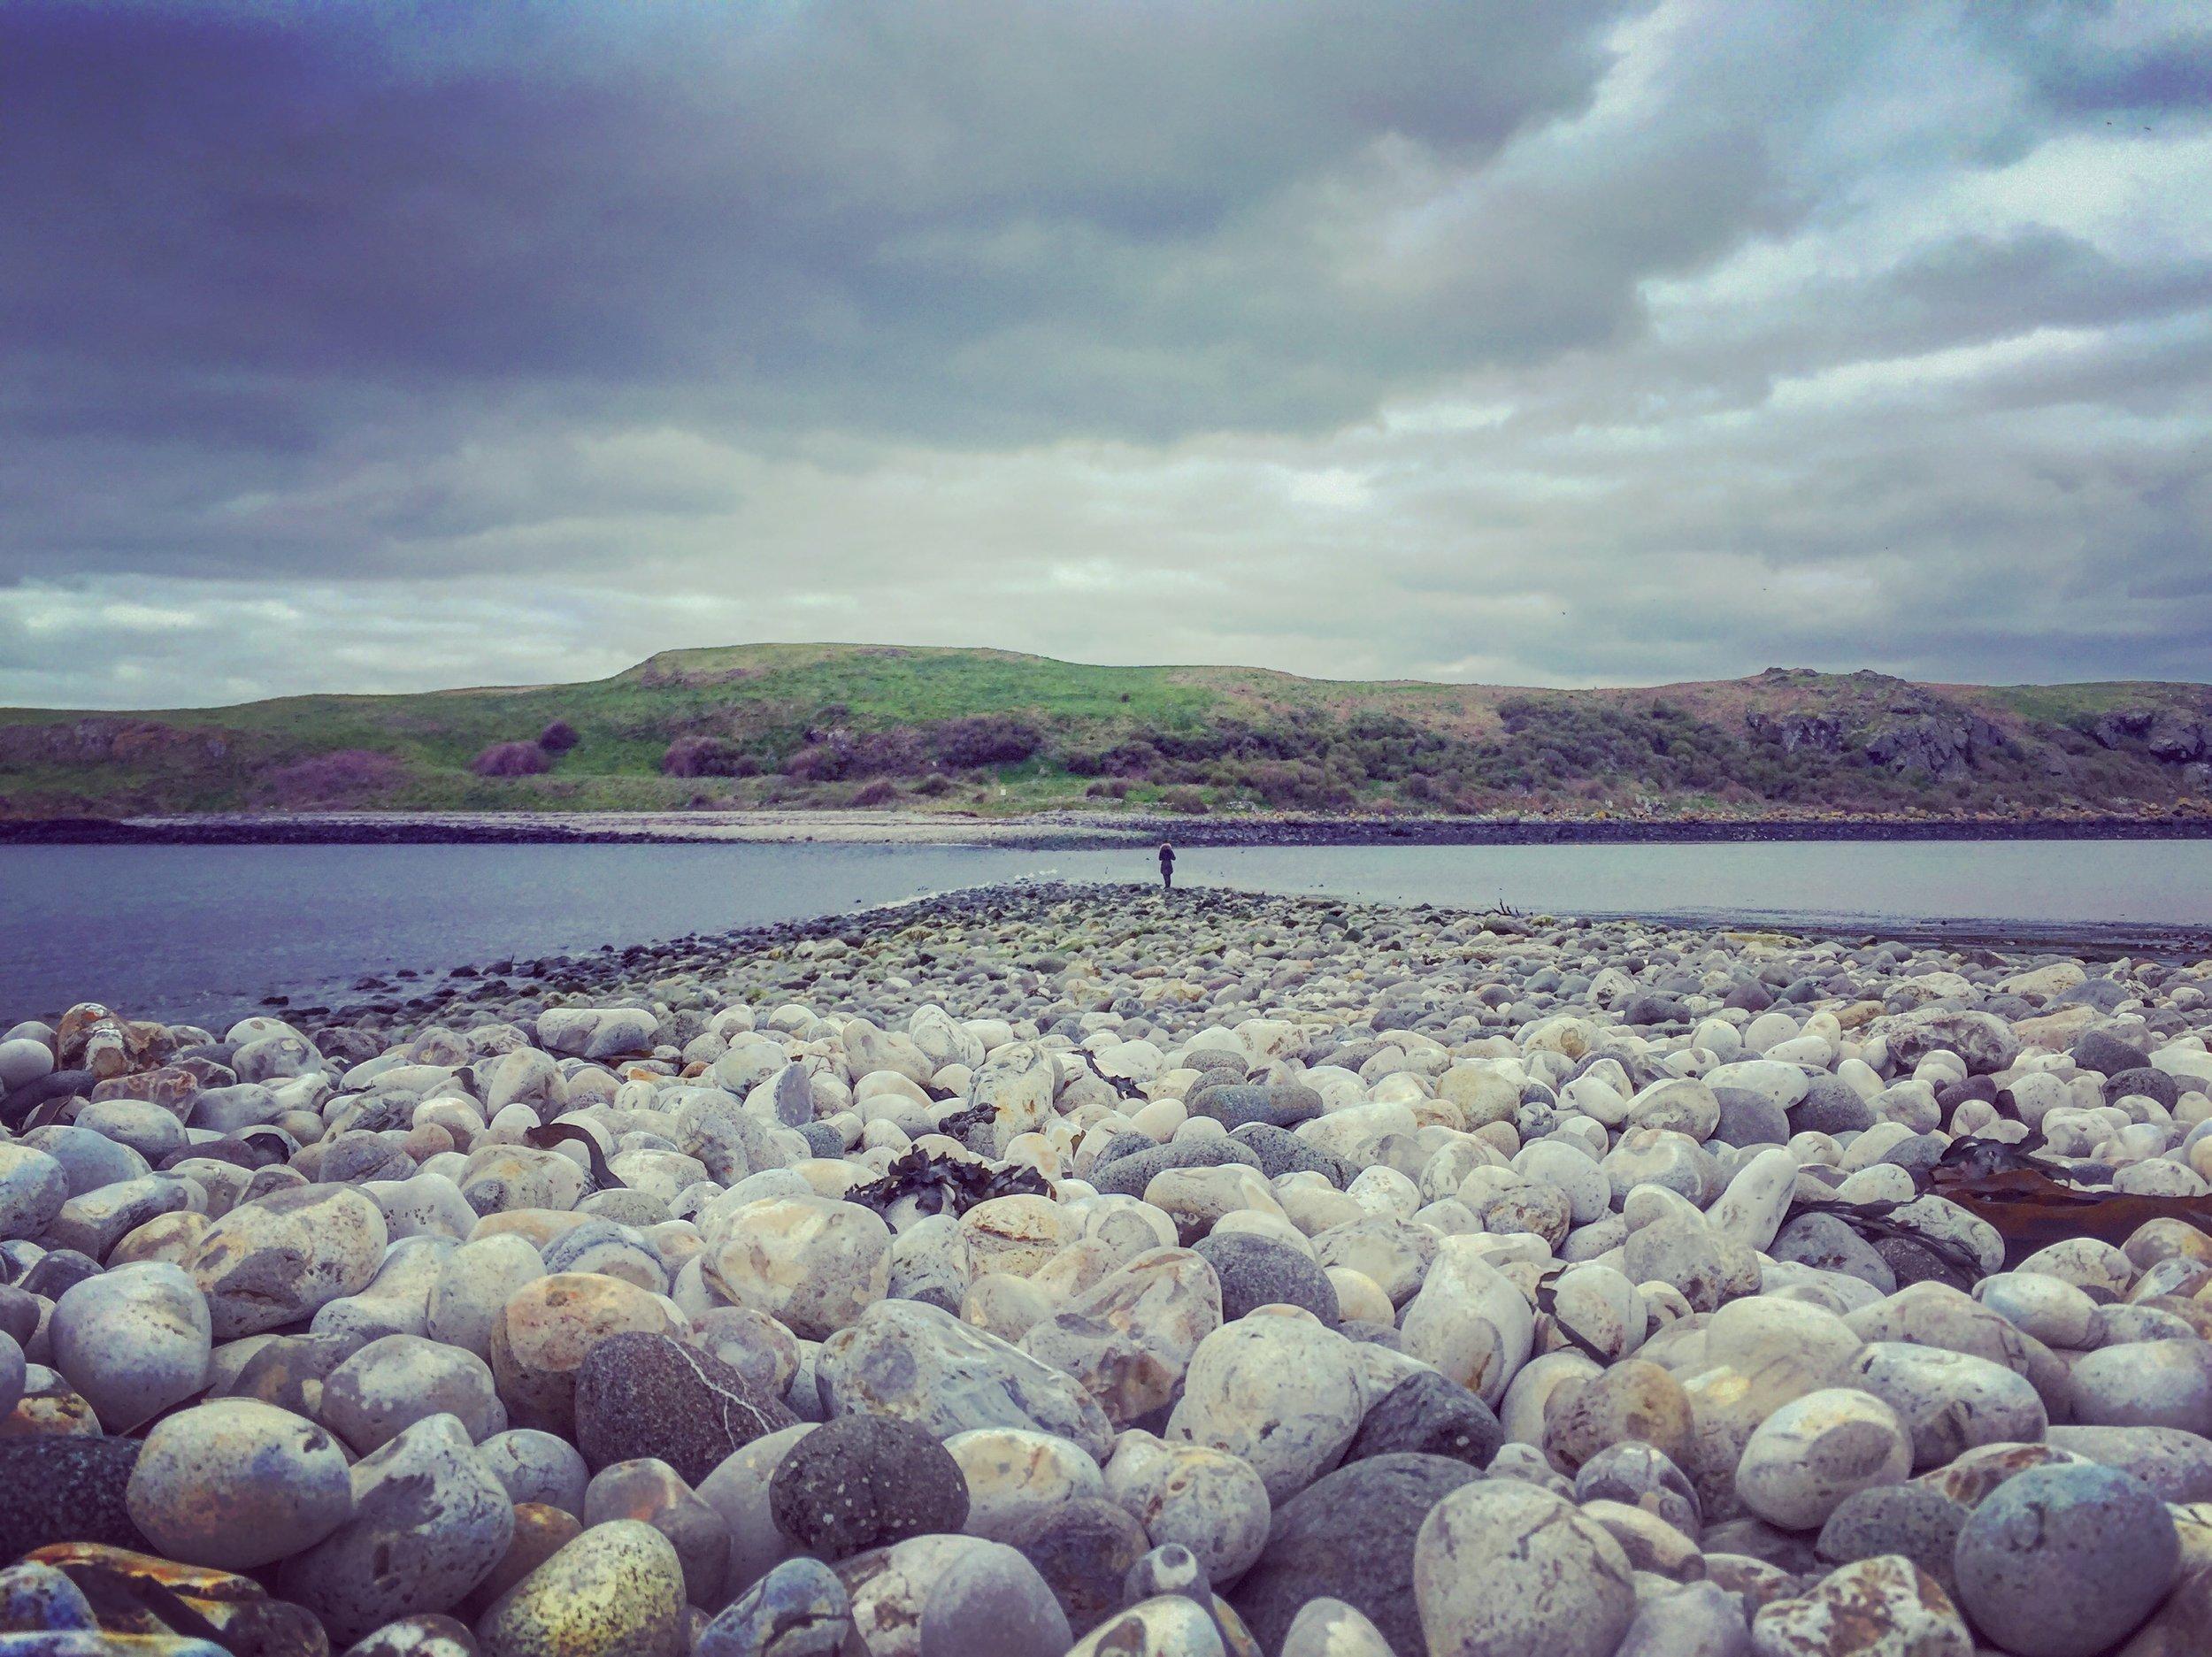 pebble_beach_panoramic_muck_island_portmuck_harbour_islandmagee_antrim_roadtrip_coast_ni_explorer_niexplorer_northern_ireland_blog.jpg